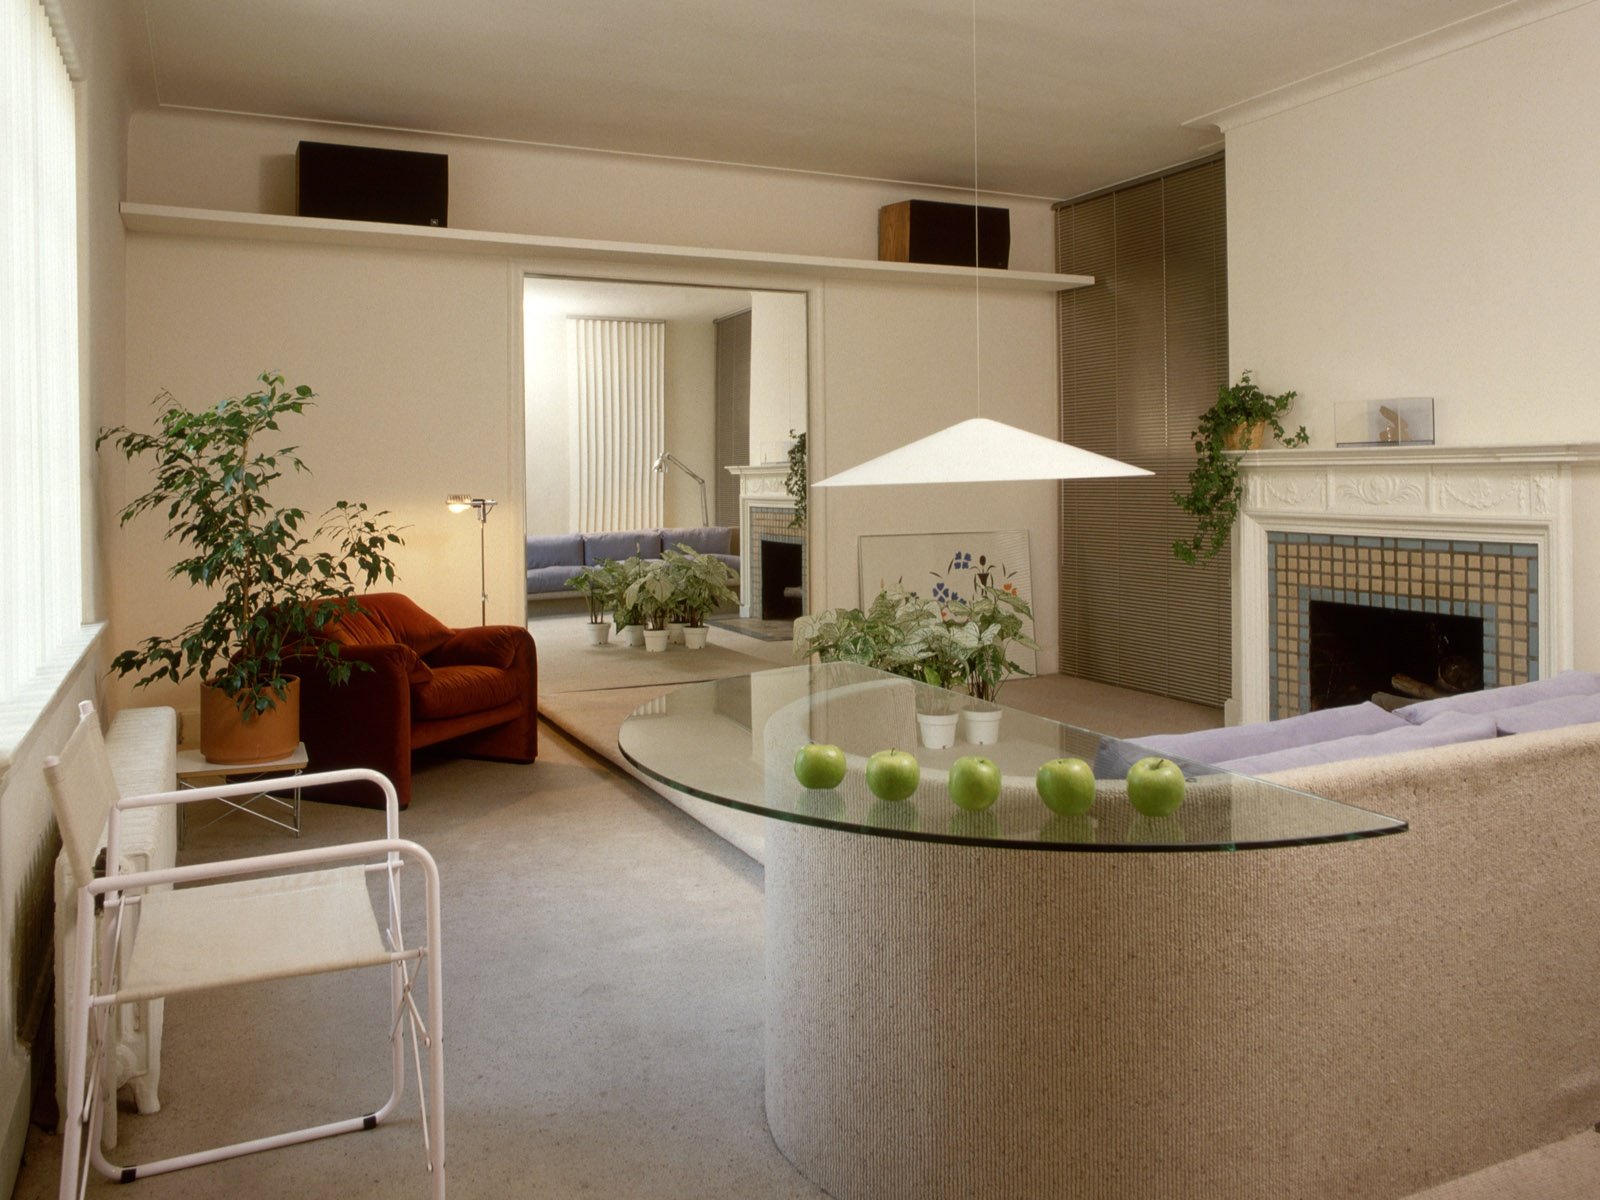 interior design hd wallpapers hd wallpaper. Black Bedroom Furniture Sets. Home Design Ideas